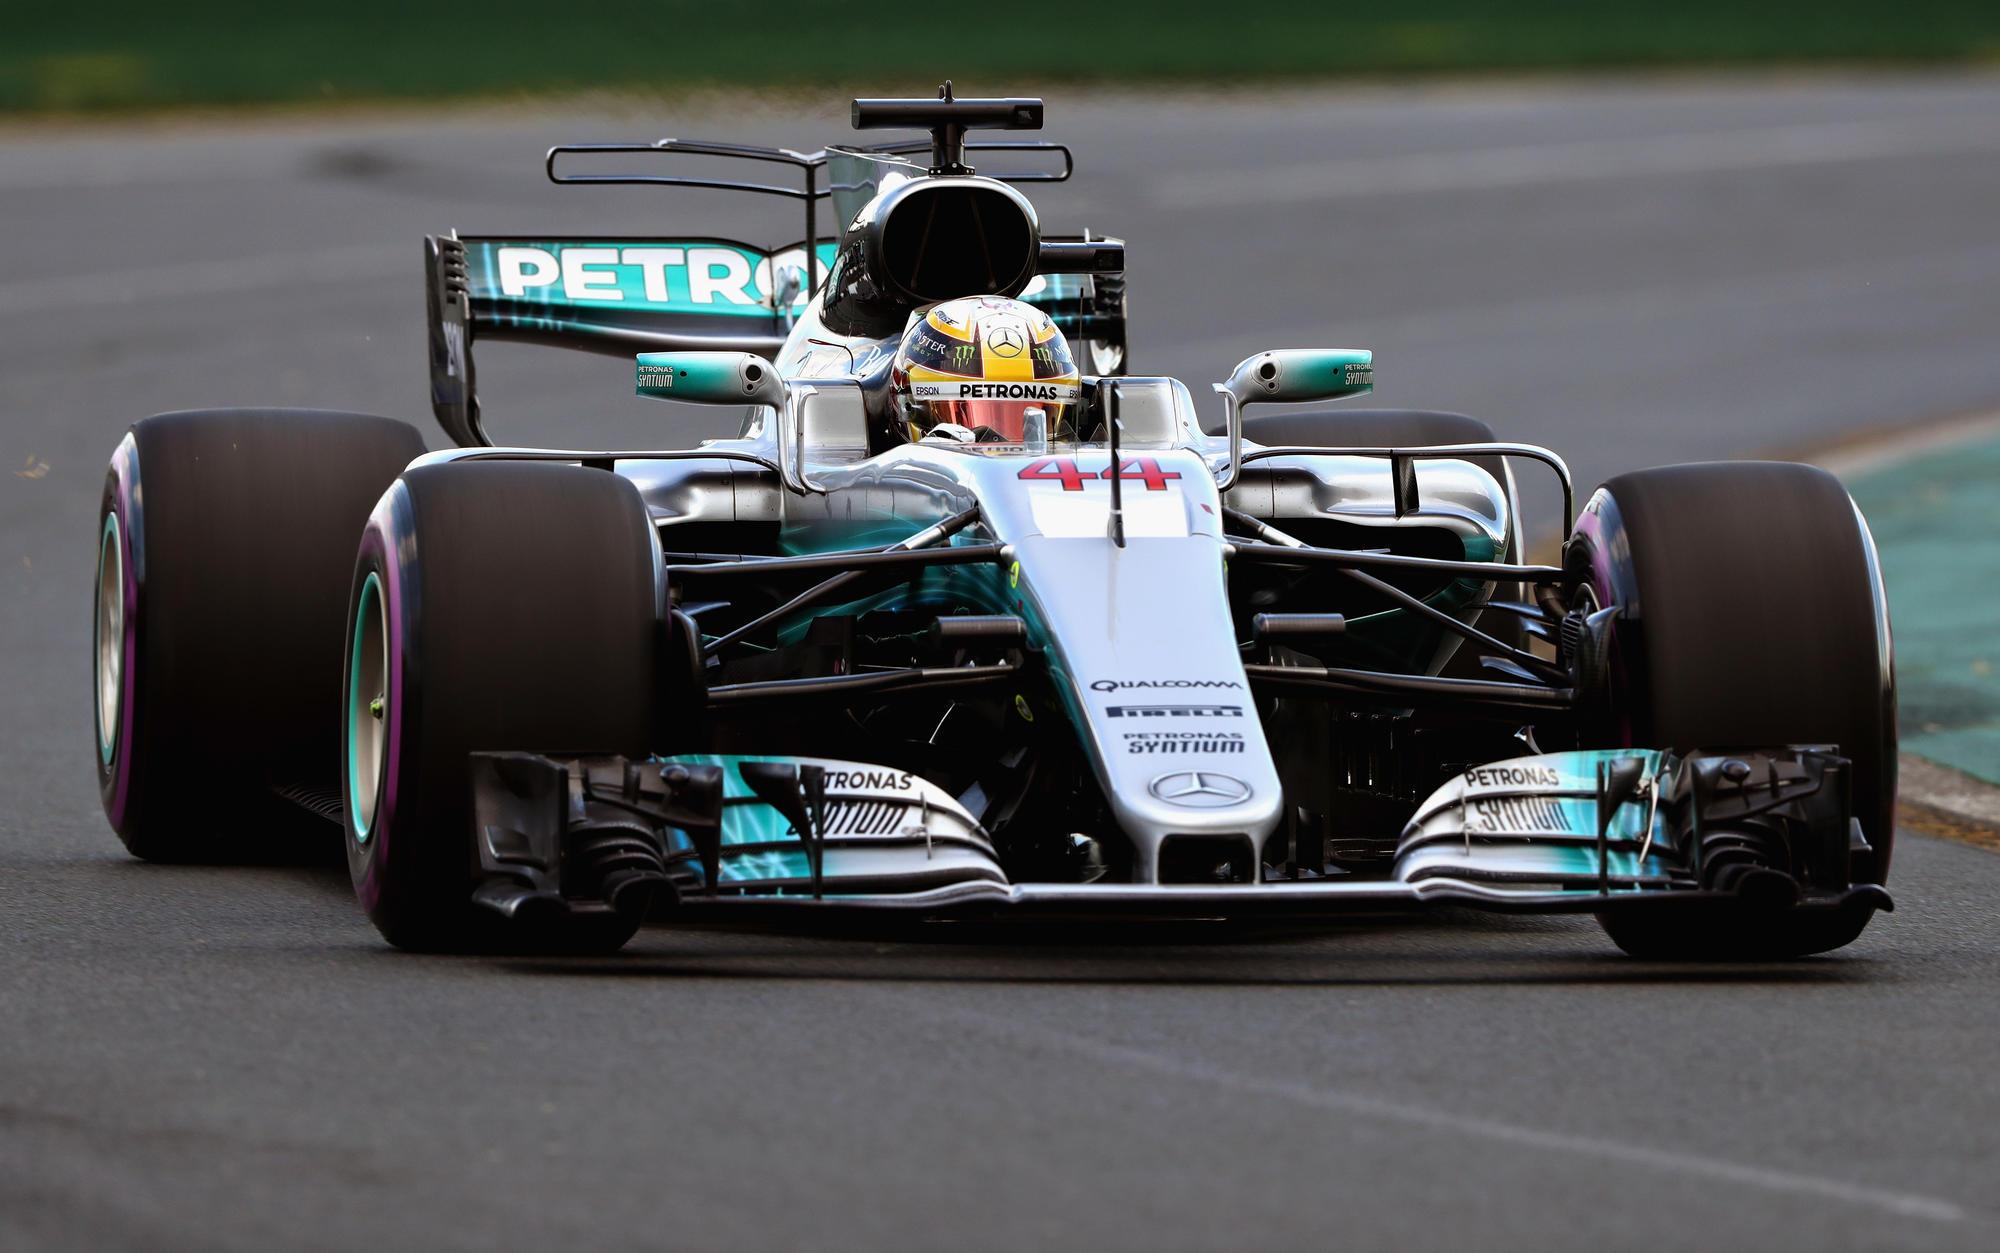 Хэмилтон одержал победу Гран-при Канады «Формулы-1»